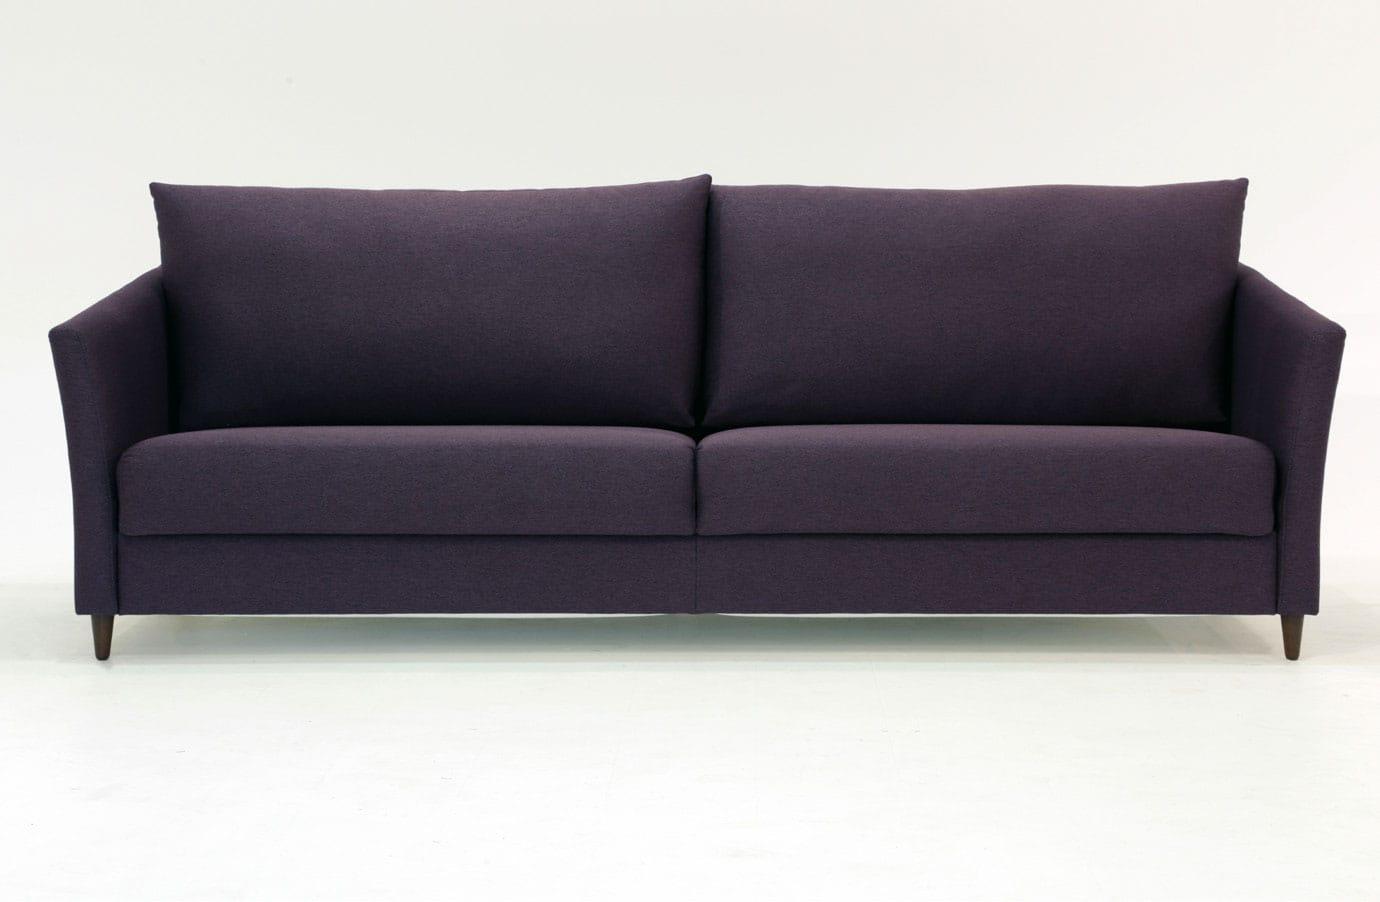 - Erika Sofa Sleeper (King Size) By Luonto Furniture